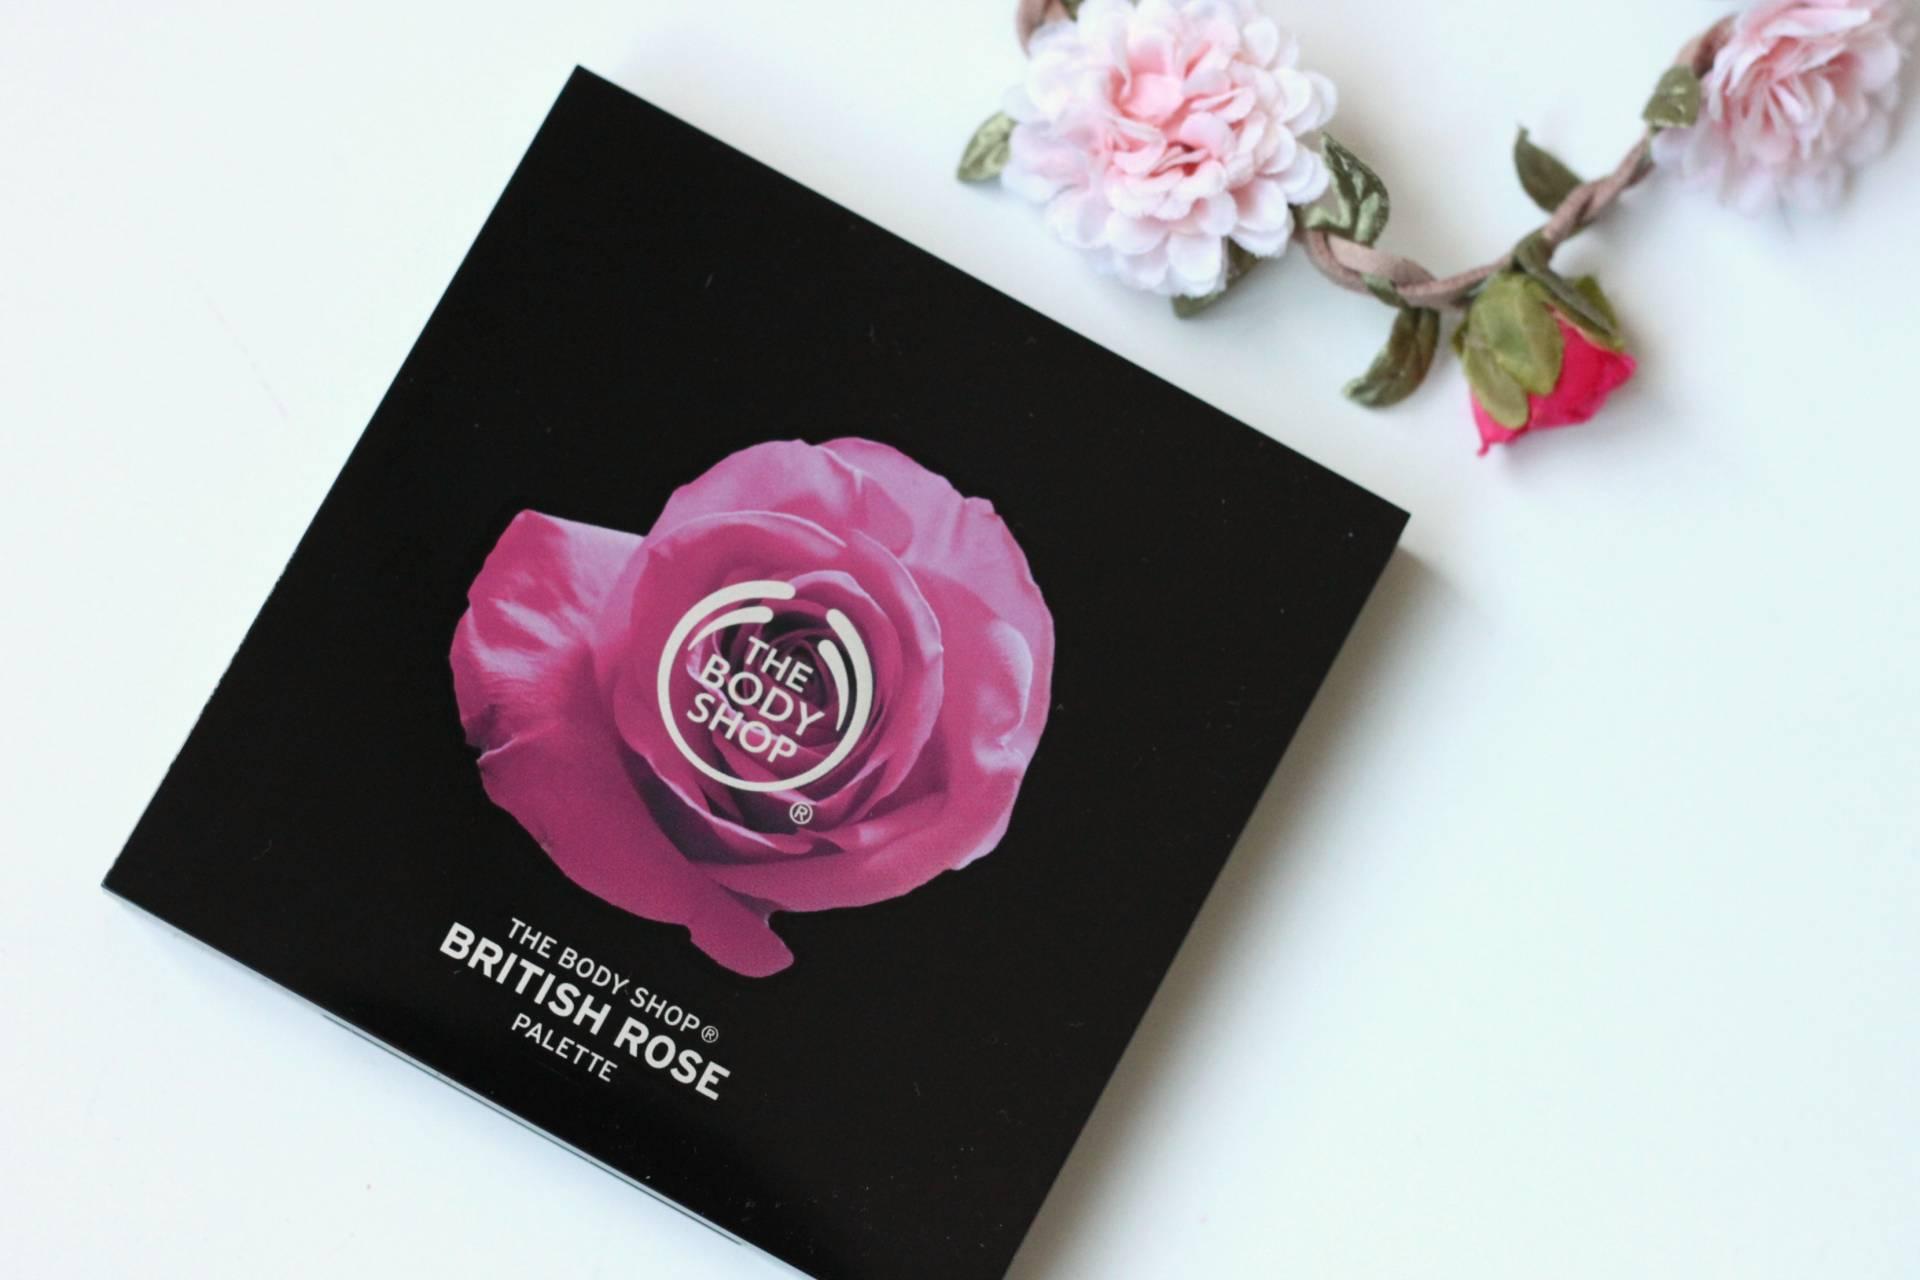 the-body-shop-british-rose-1